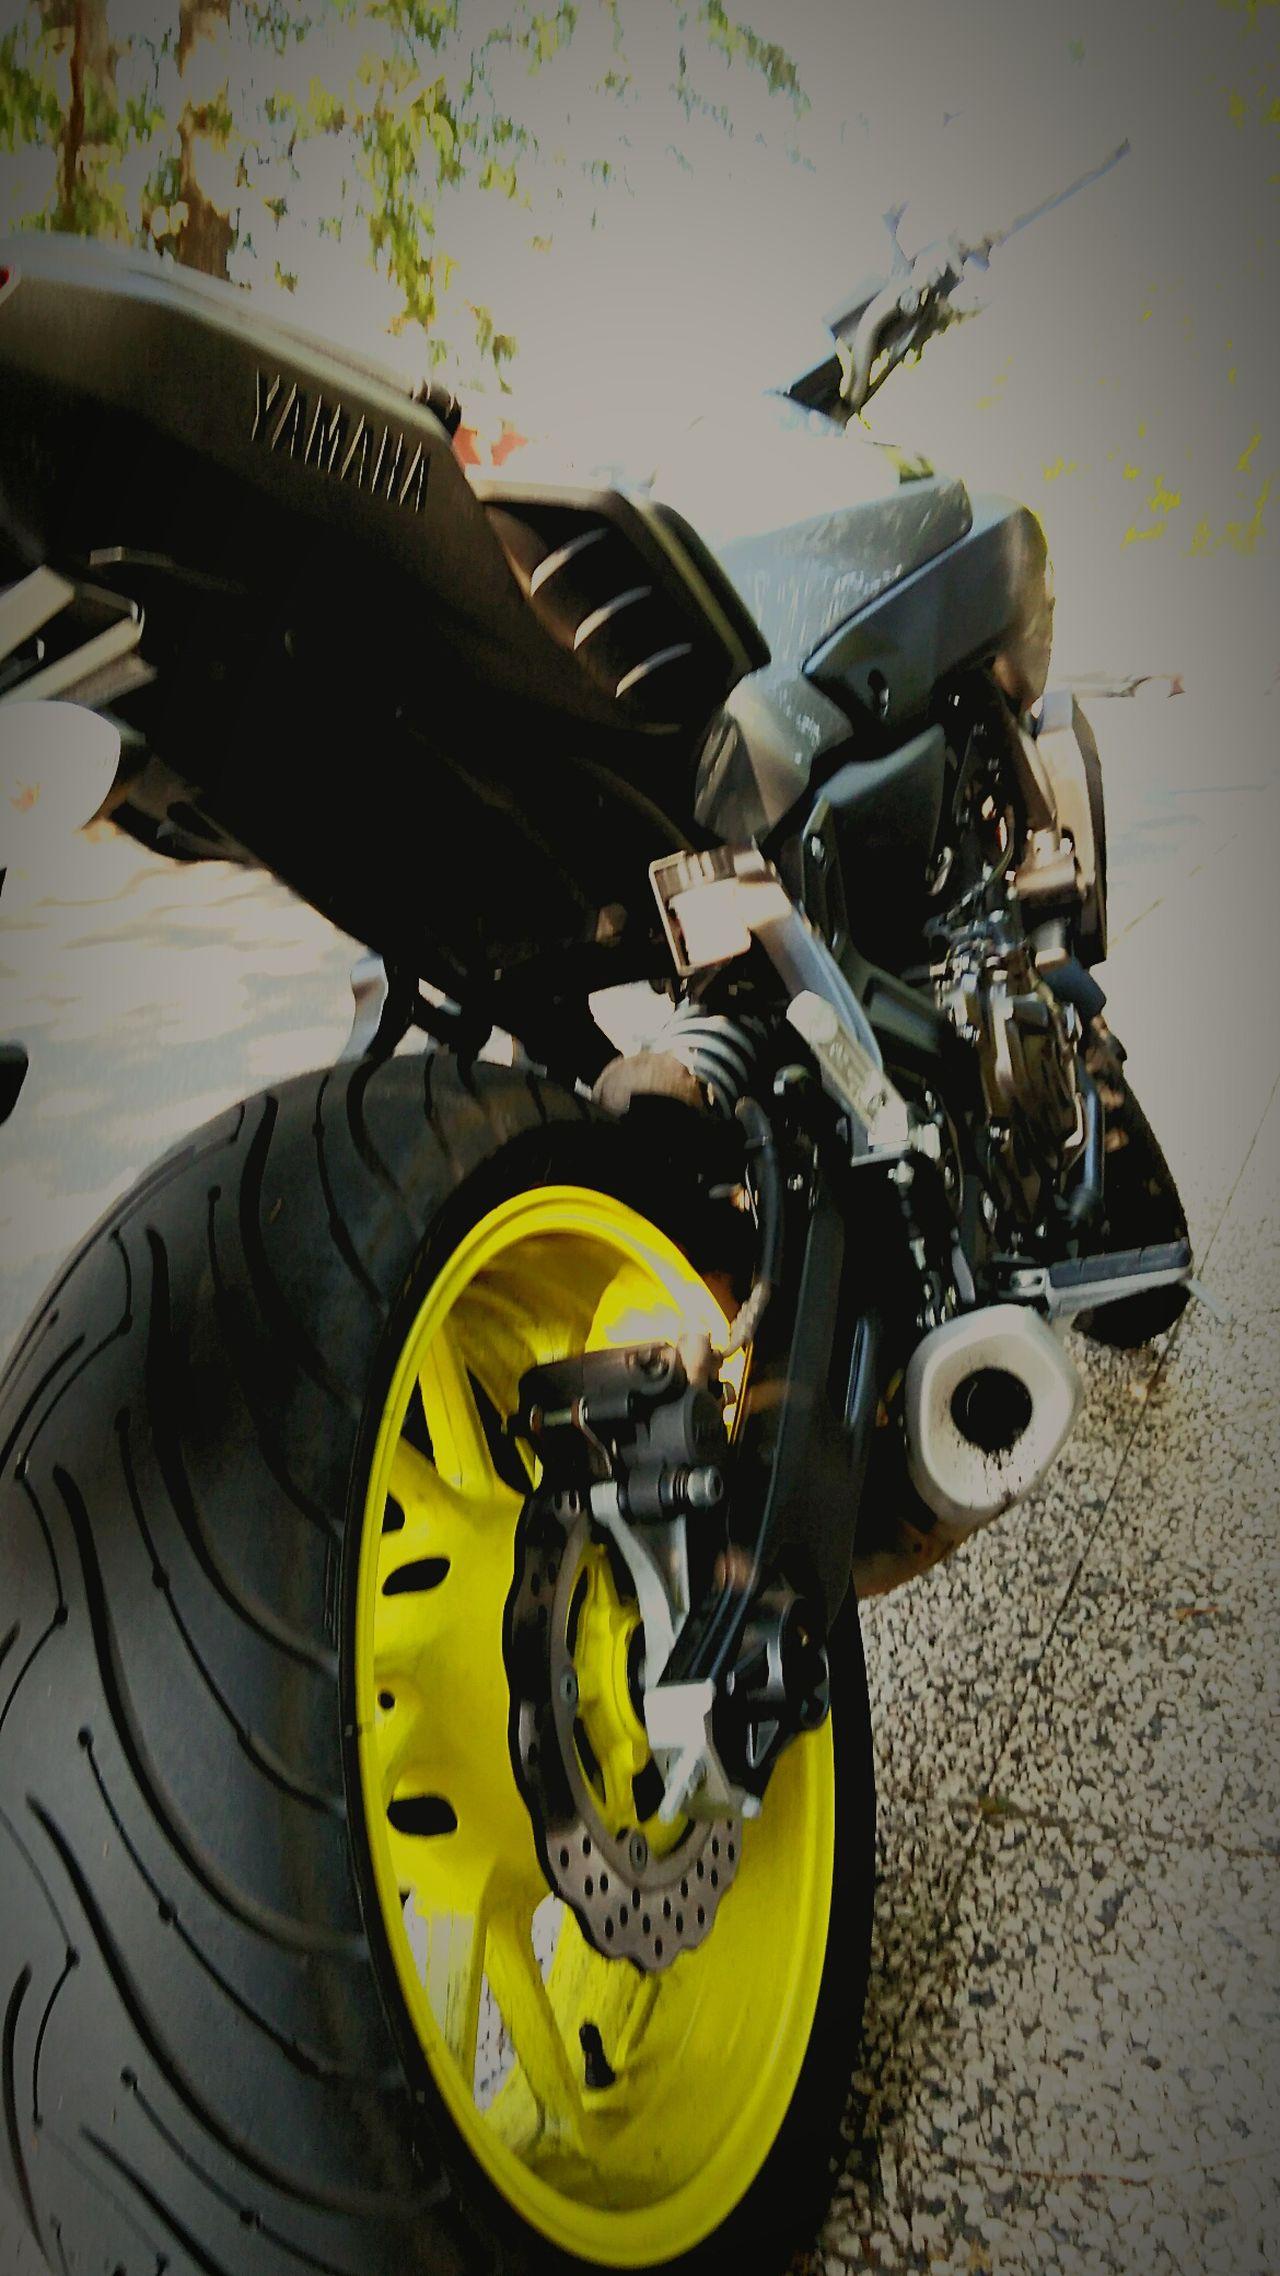 Motorcycle Bike Ride